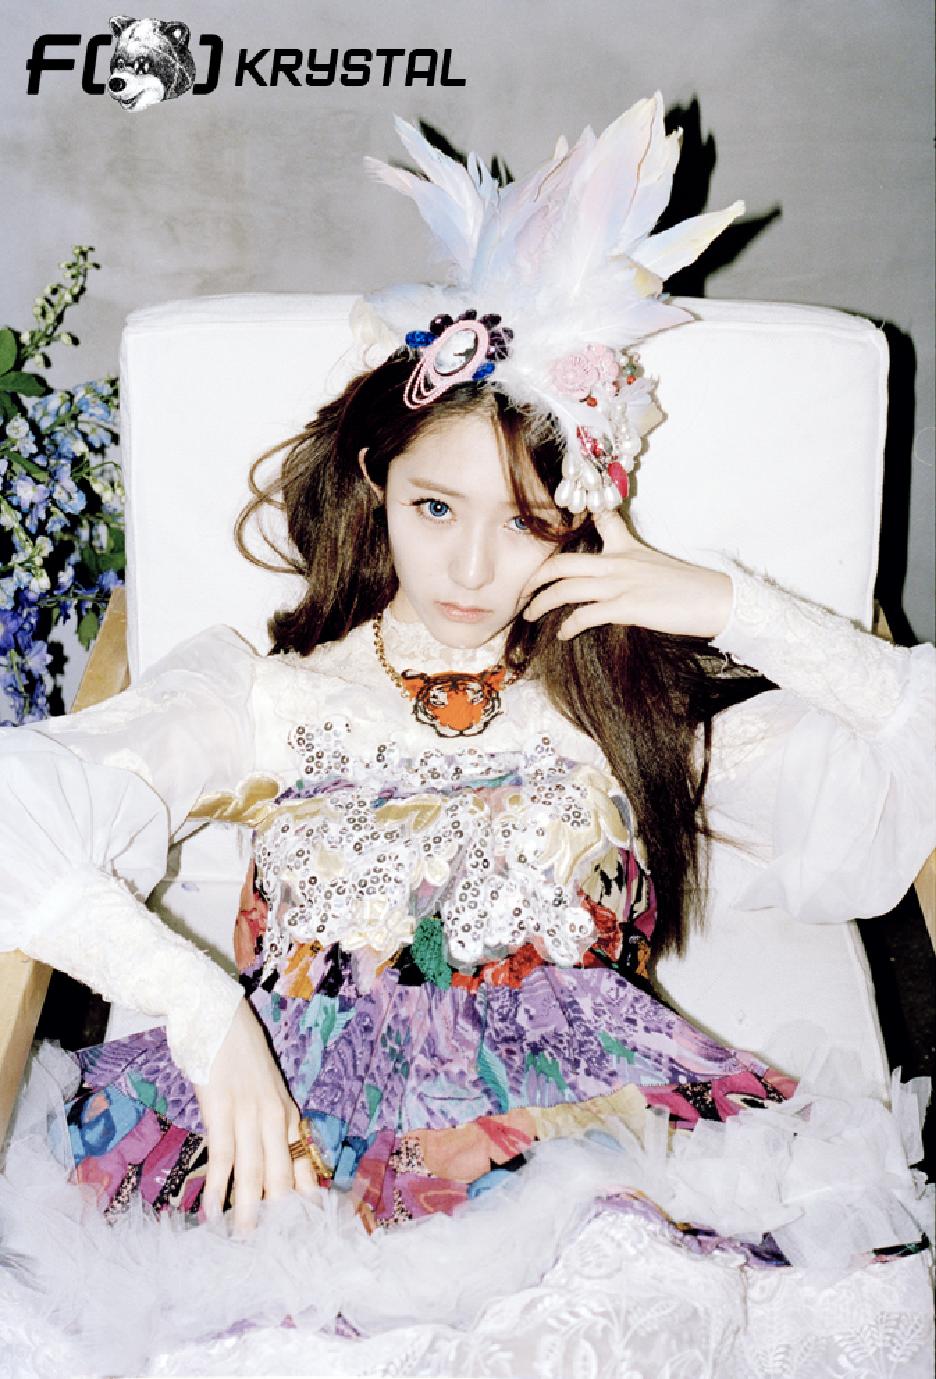 Khuntoria-2PM-f(x)-SHINee-RunningMan: f(x) profiles and ... F(x) Electric Shock Krystal